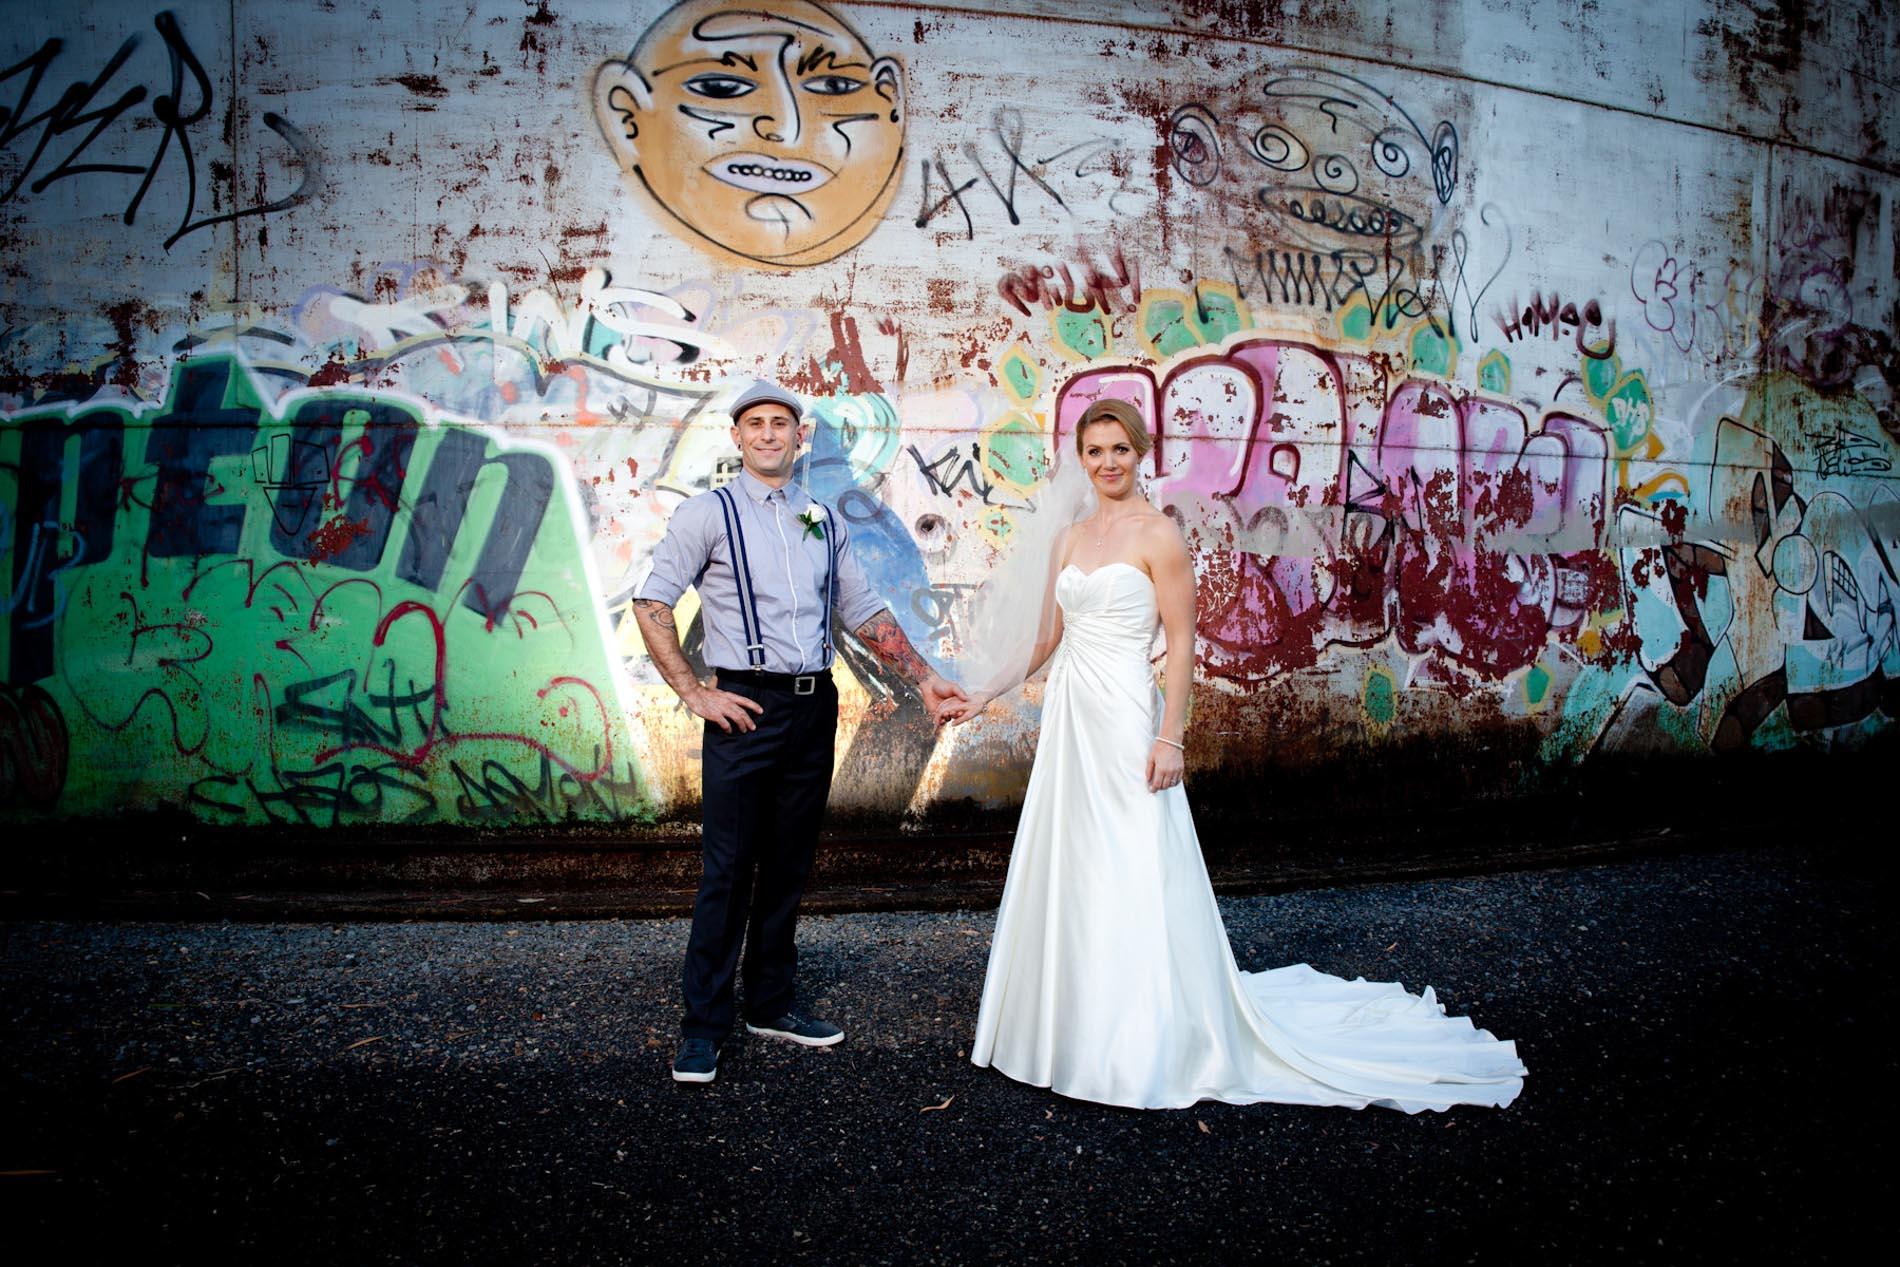 Cairns Wedding Photography, Yunguburra wedding photography, Atherton Tablelands wedding photography, Nathan David Kelly Cairns Wedding Photography.